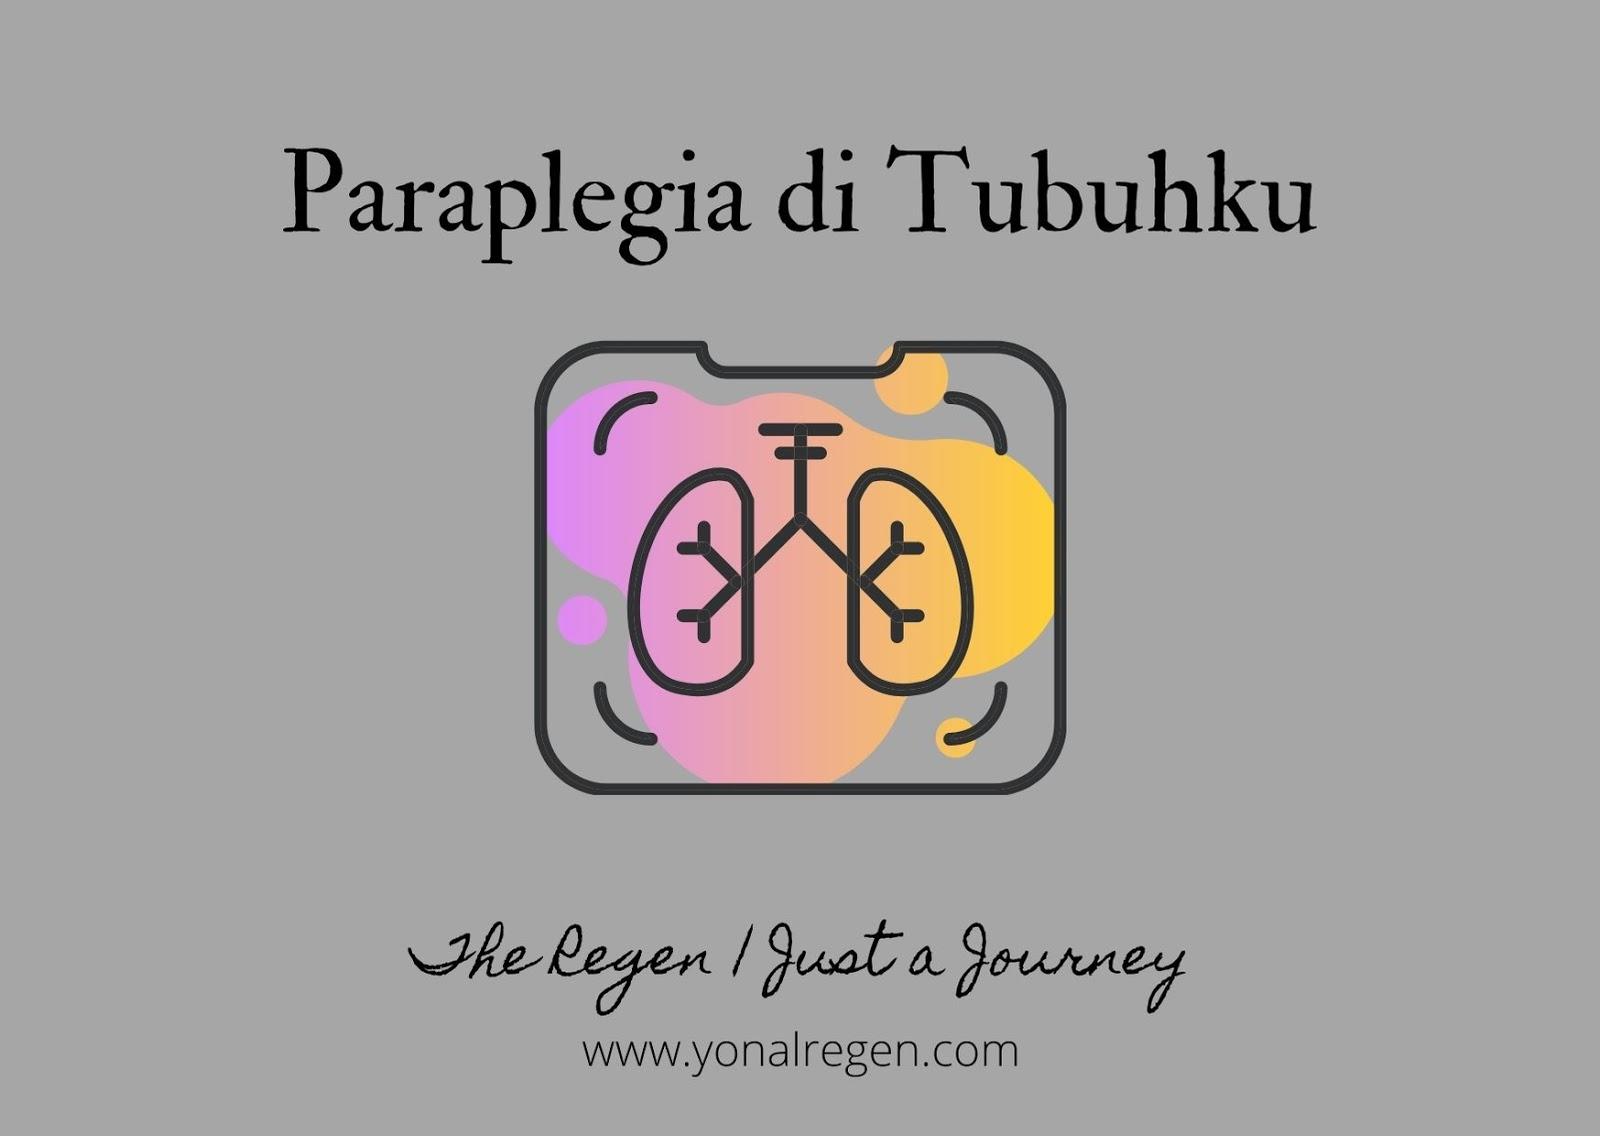 paraplegia di tubuhku